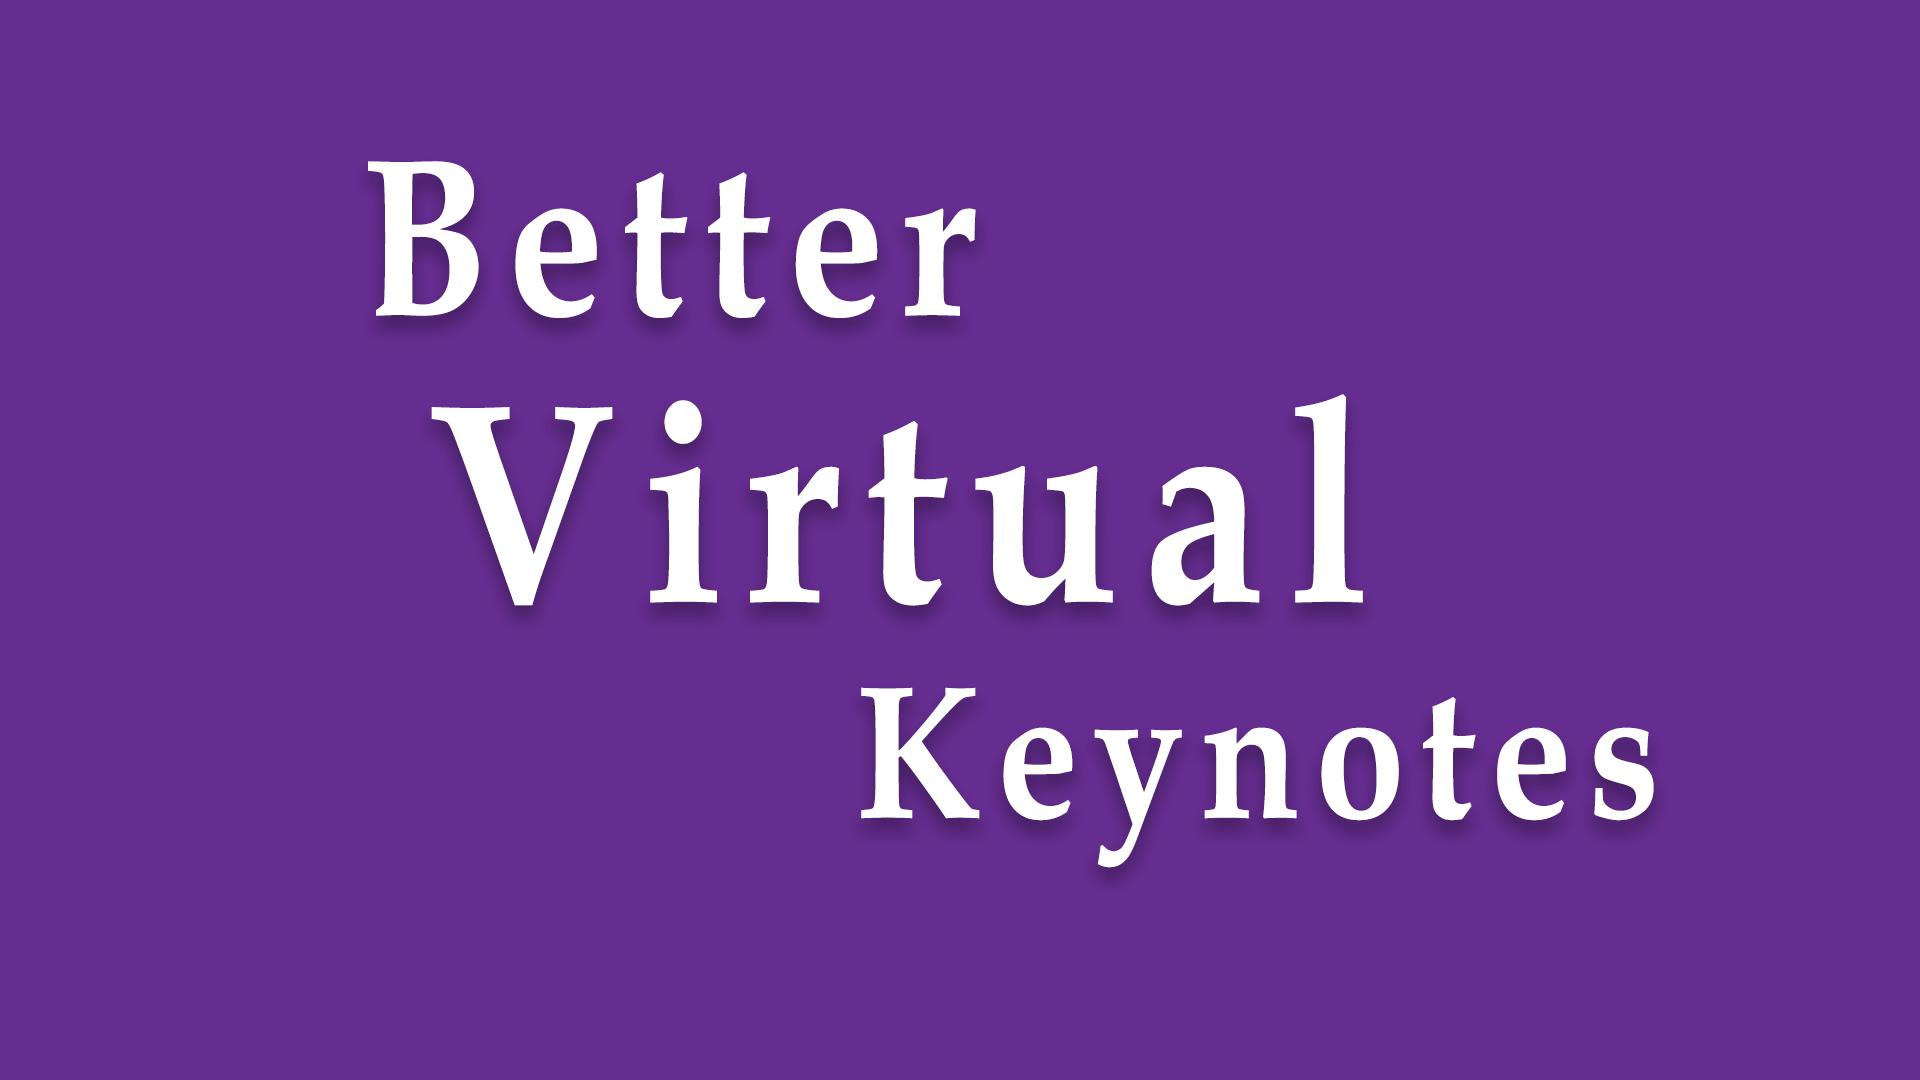 Better Virtual Keynotes